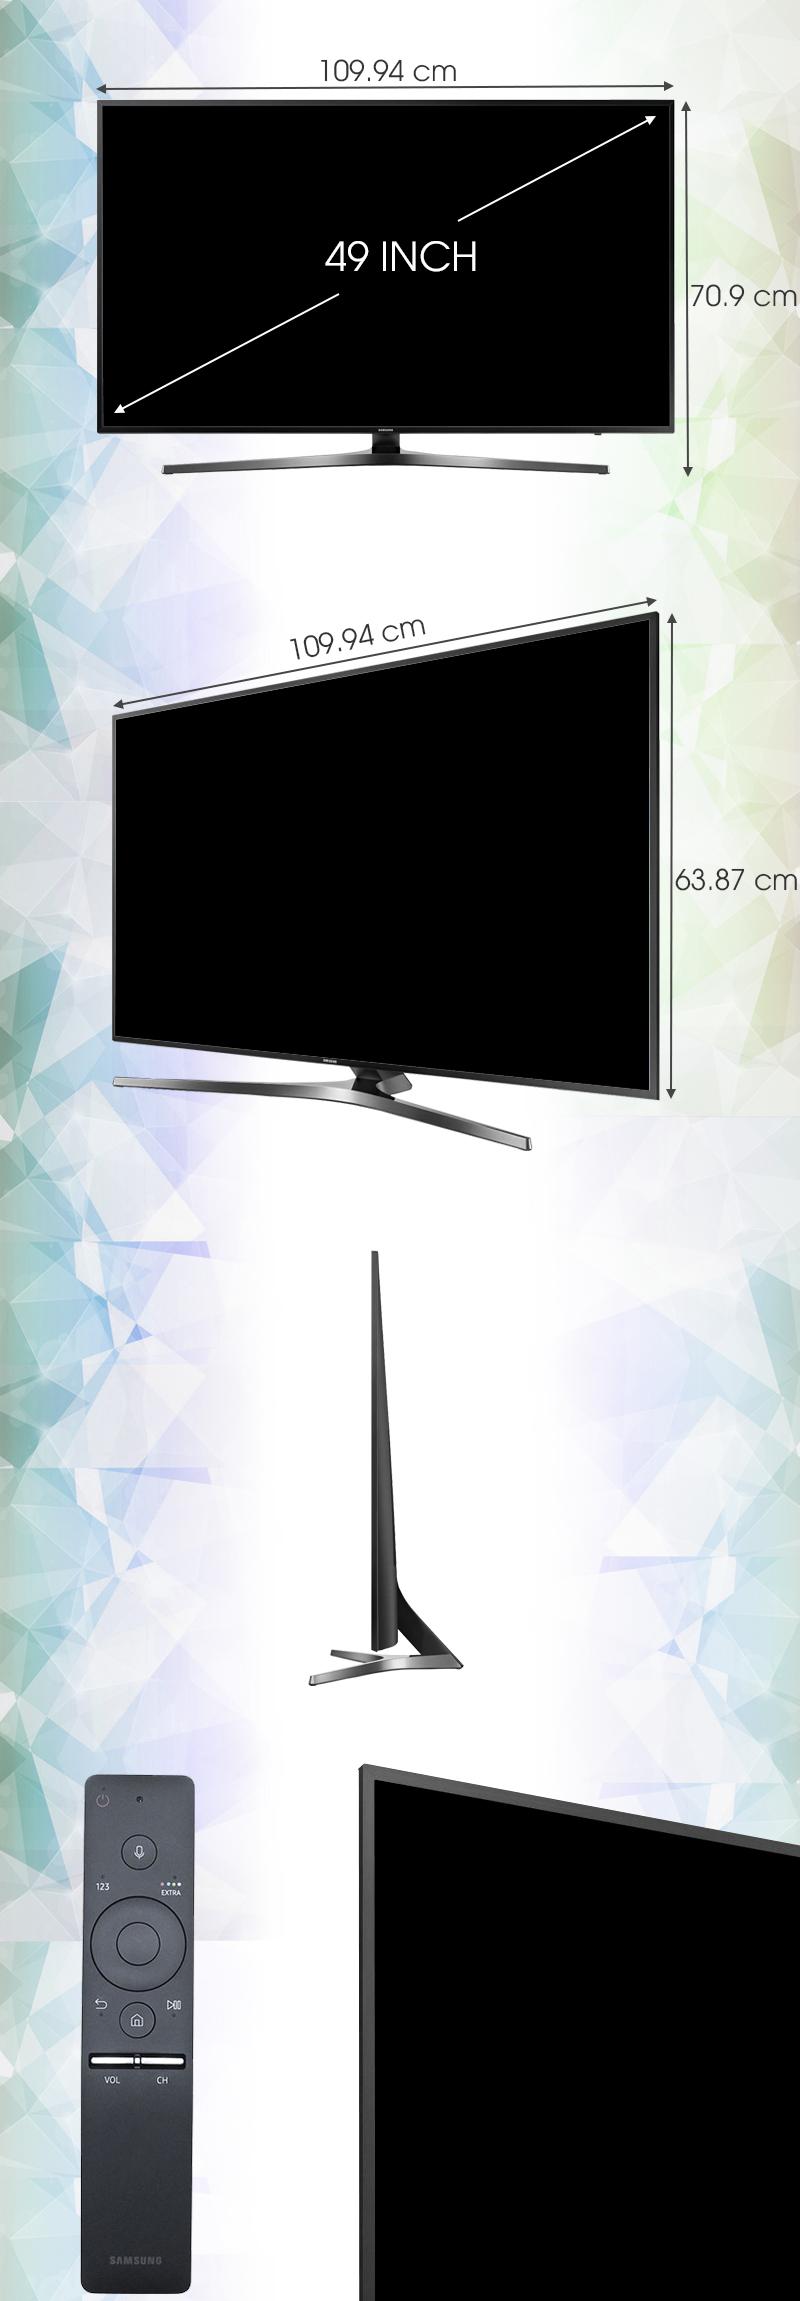 Smart Tivi Samsung 49 inch UA49KU6400 - Kích thước TV